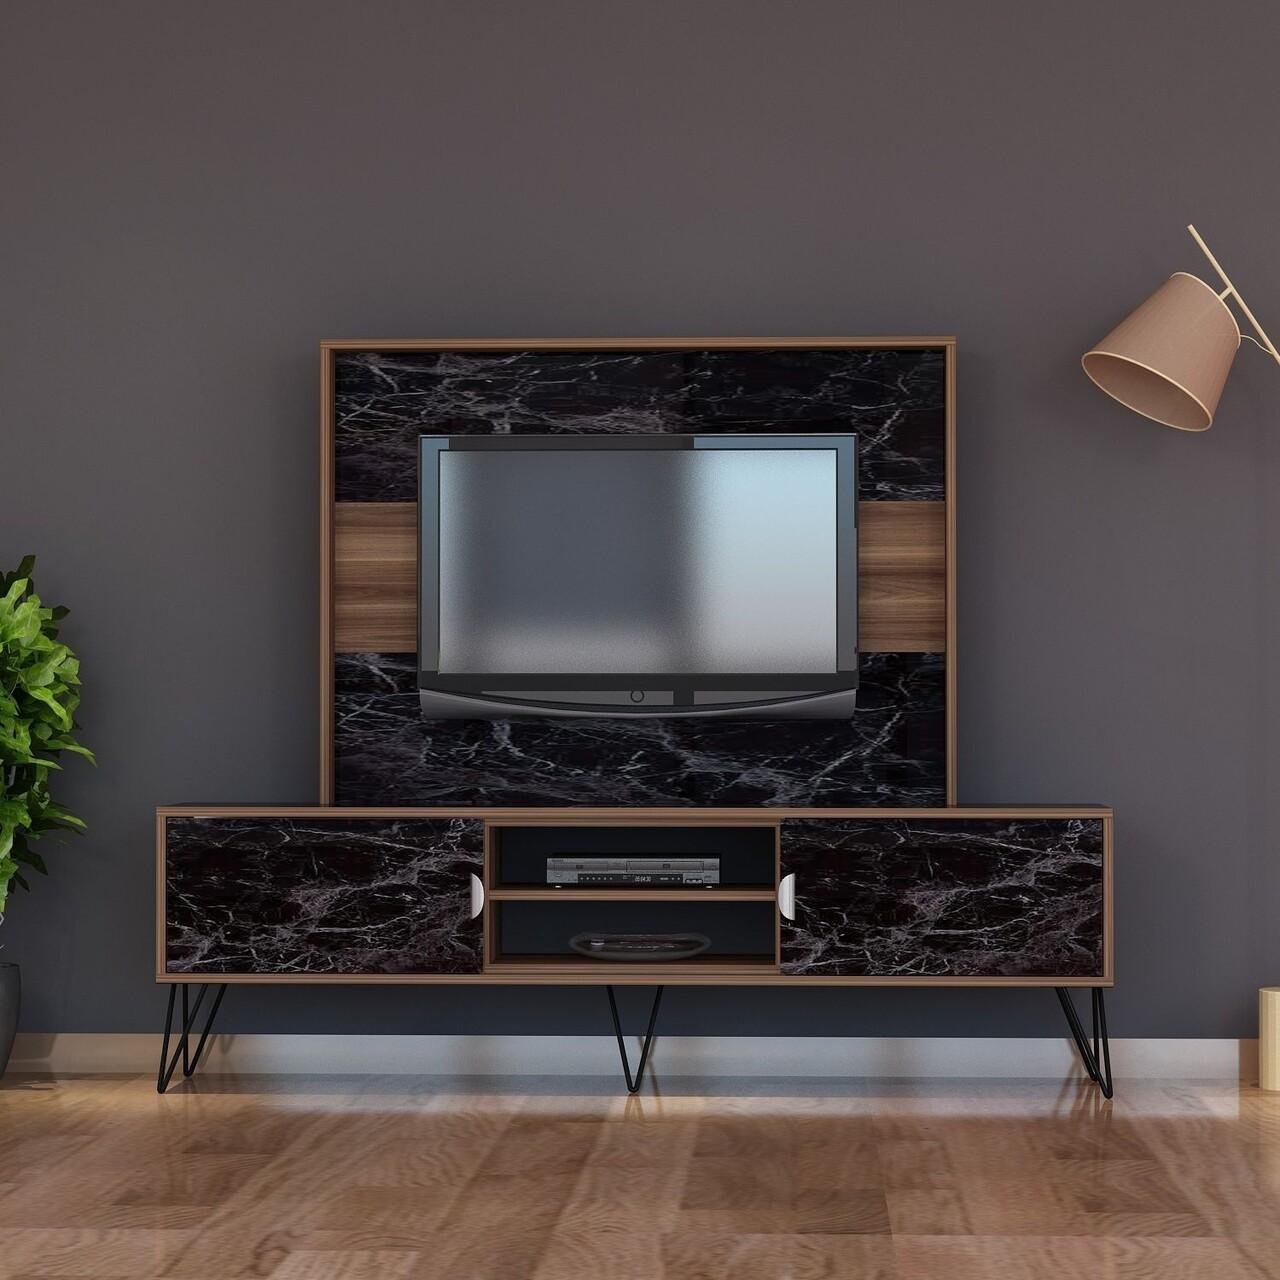 Comoda TV RAIN1, Gauge Concept, 180x30x145 cm, PAL, aluna/negru